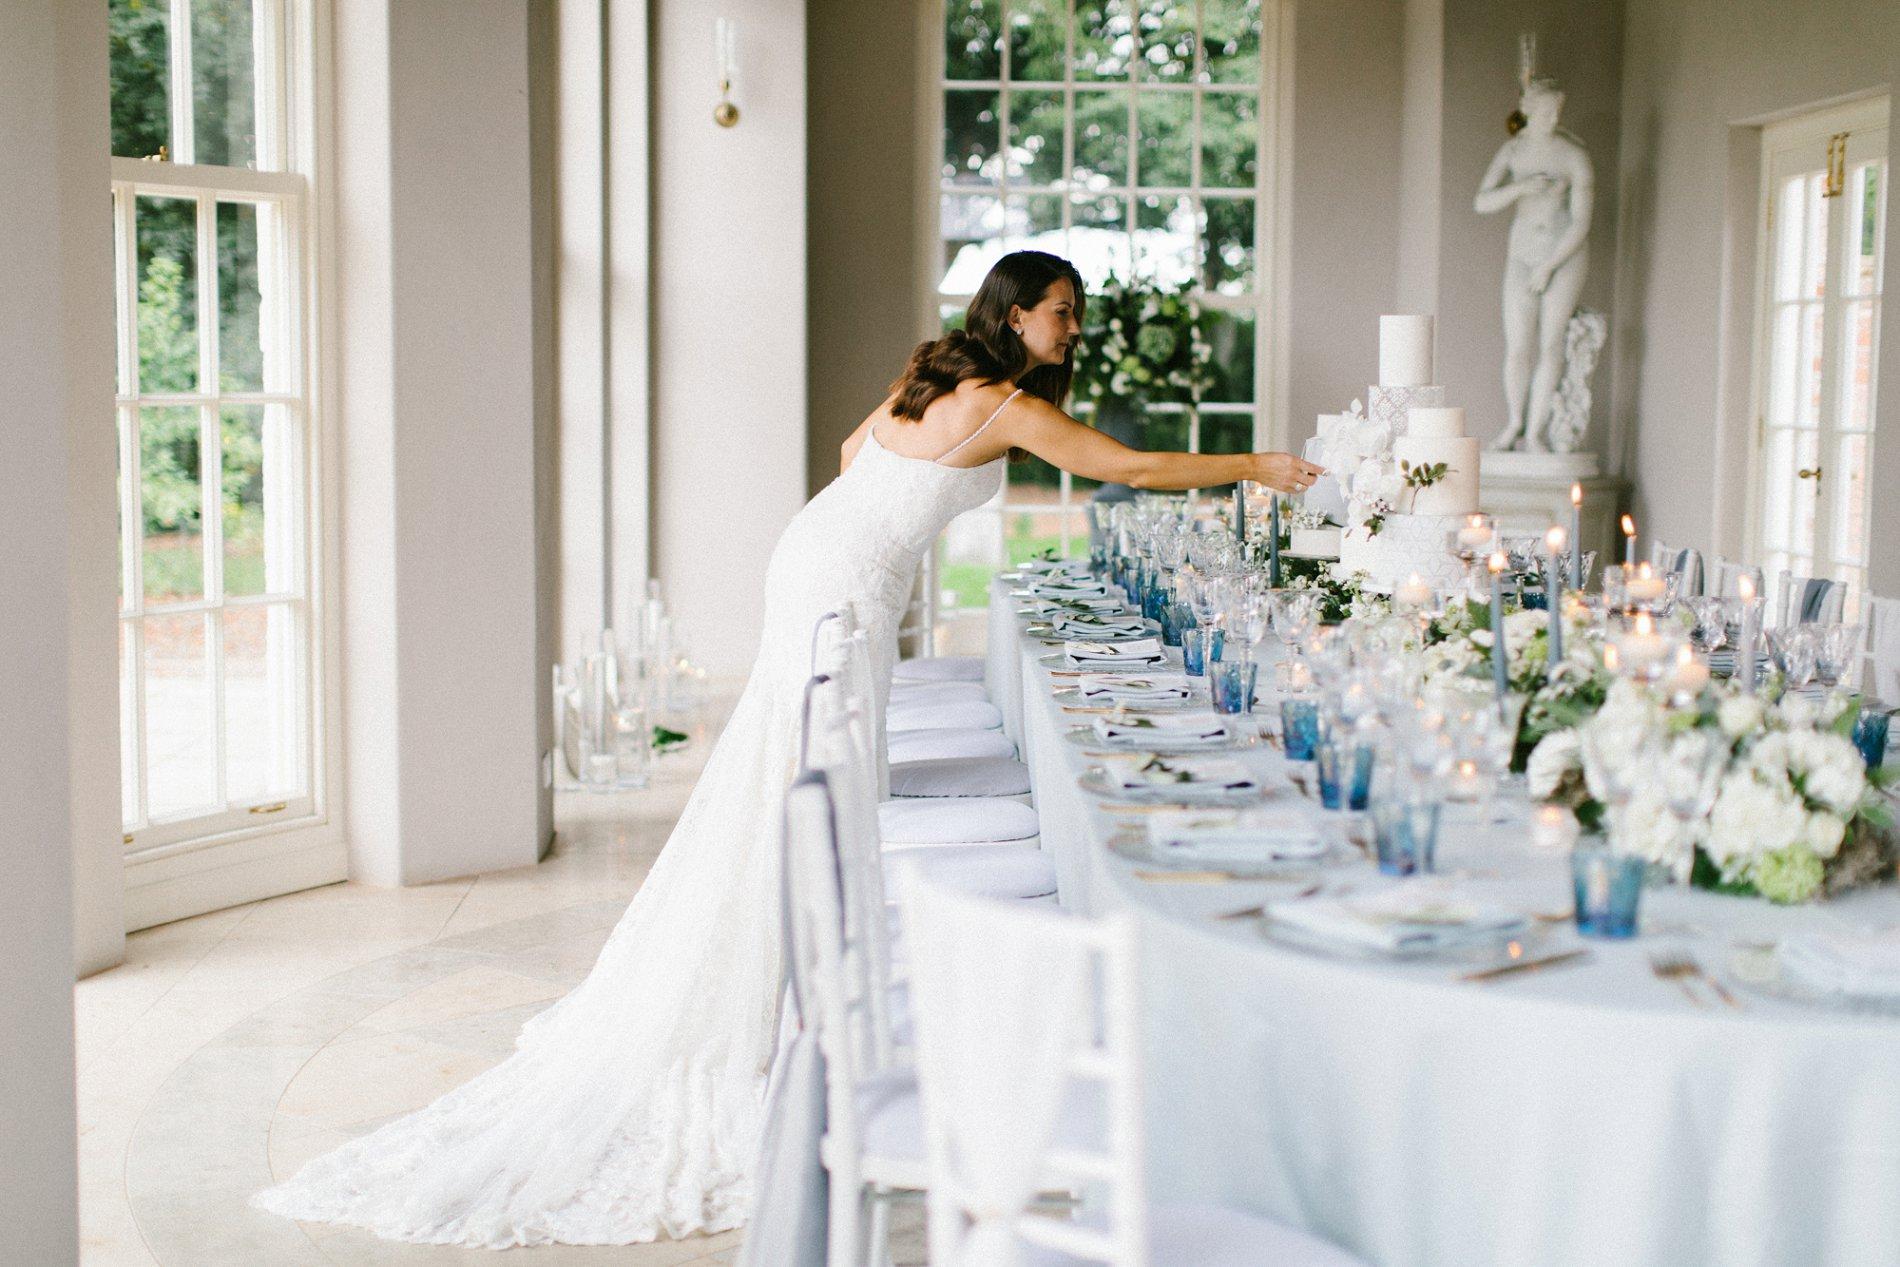 An Intimate Fine Art Wedding Shoot at Newby Hall (c) Melissa Beattie Photography (37)